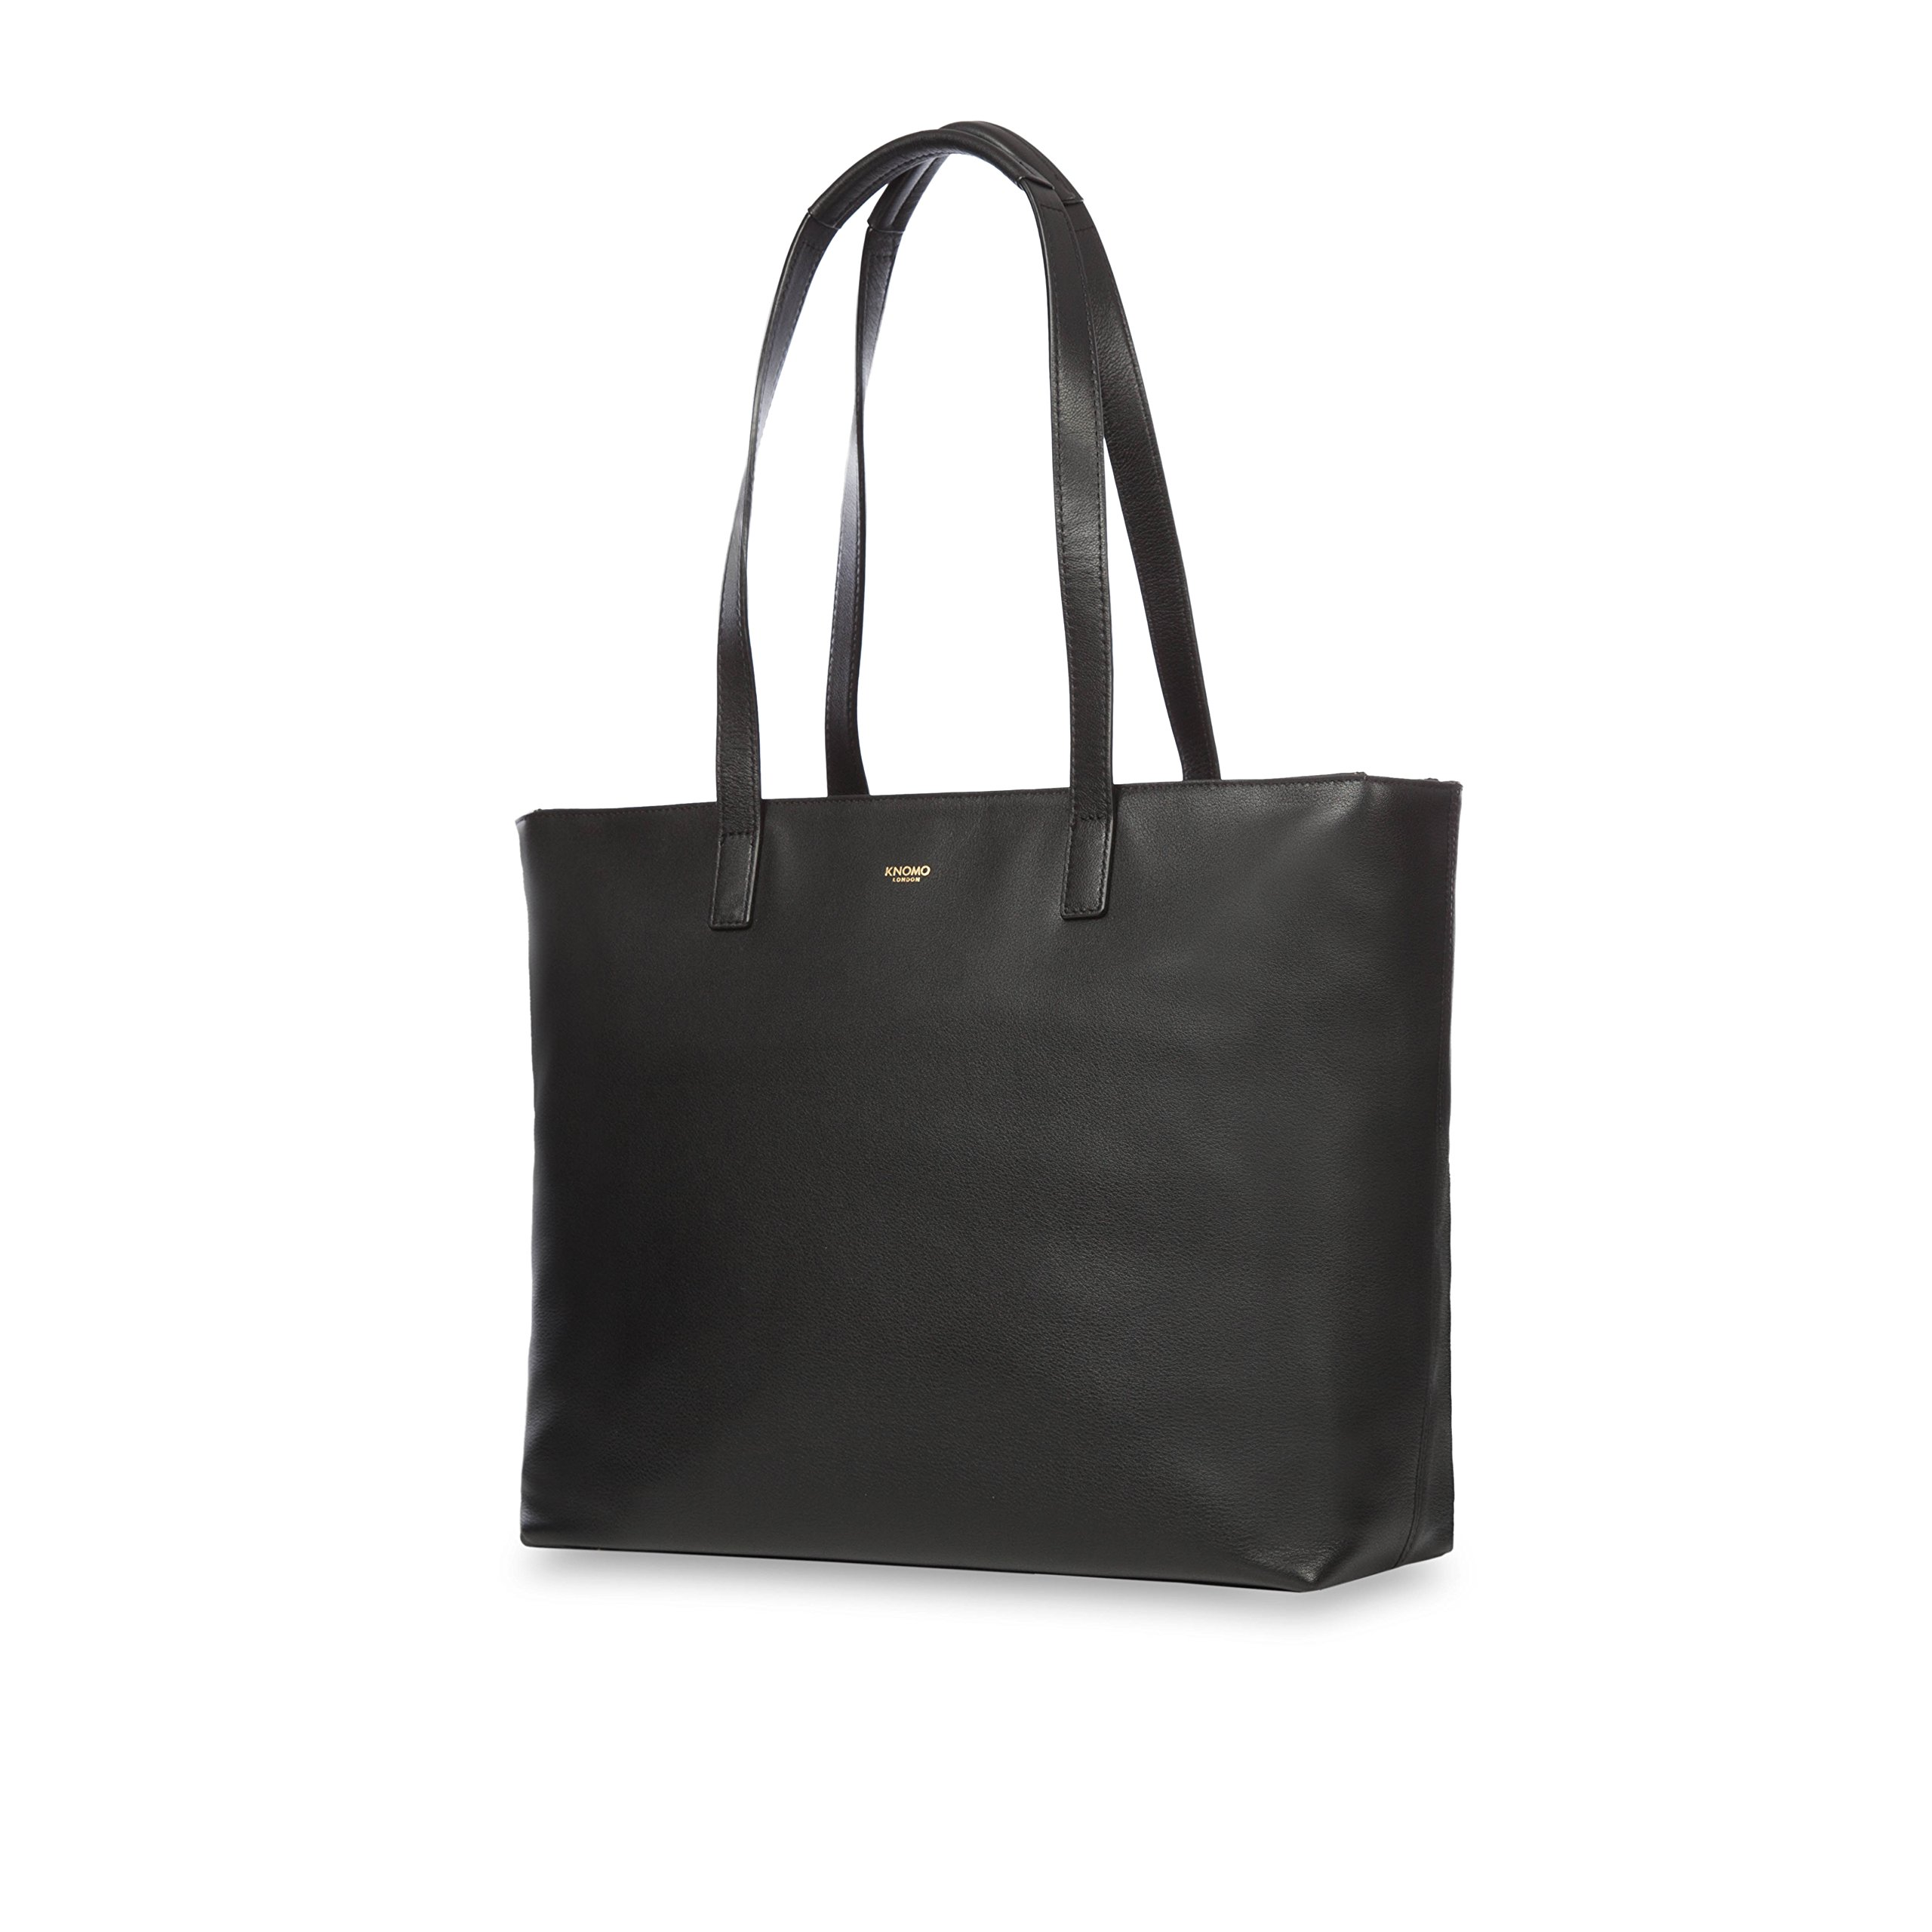 Knomo Luggage Women's Maddox Travel Shoulder Bag, Black, One Size